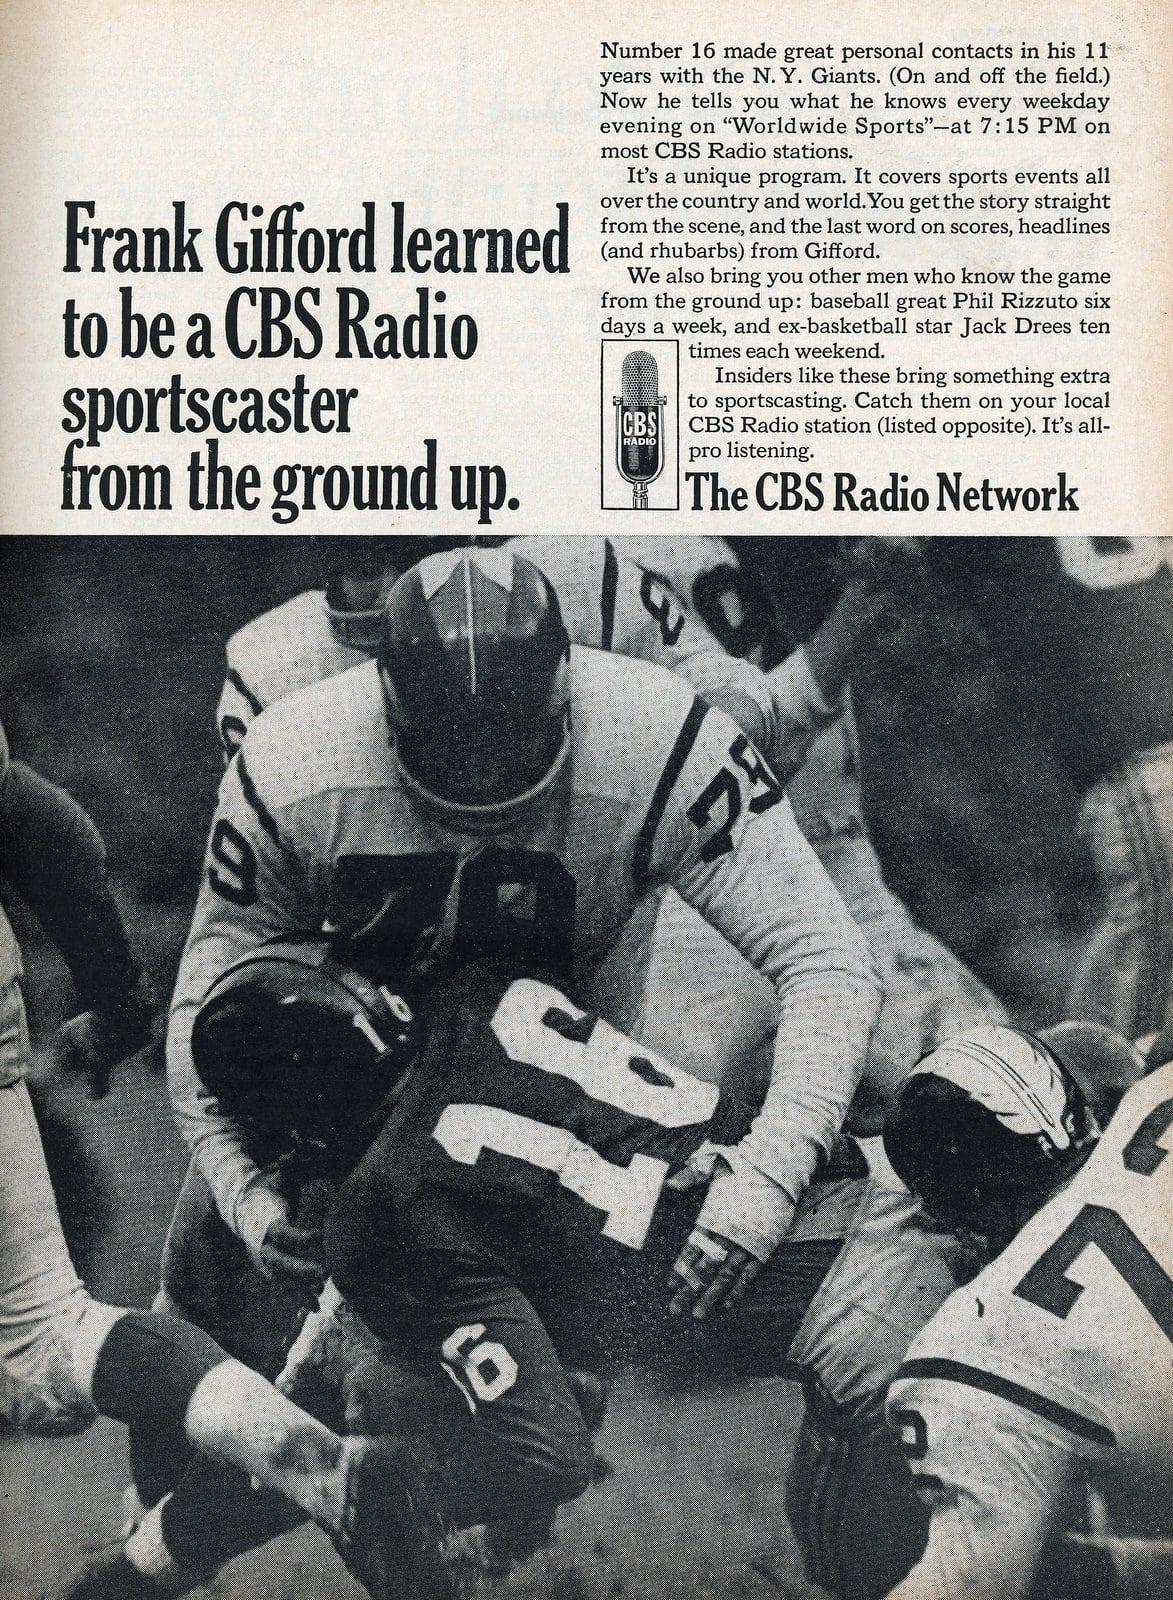 Football player Frank Gifford on CBS Radio (1966)